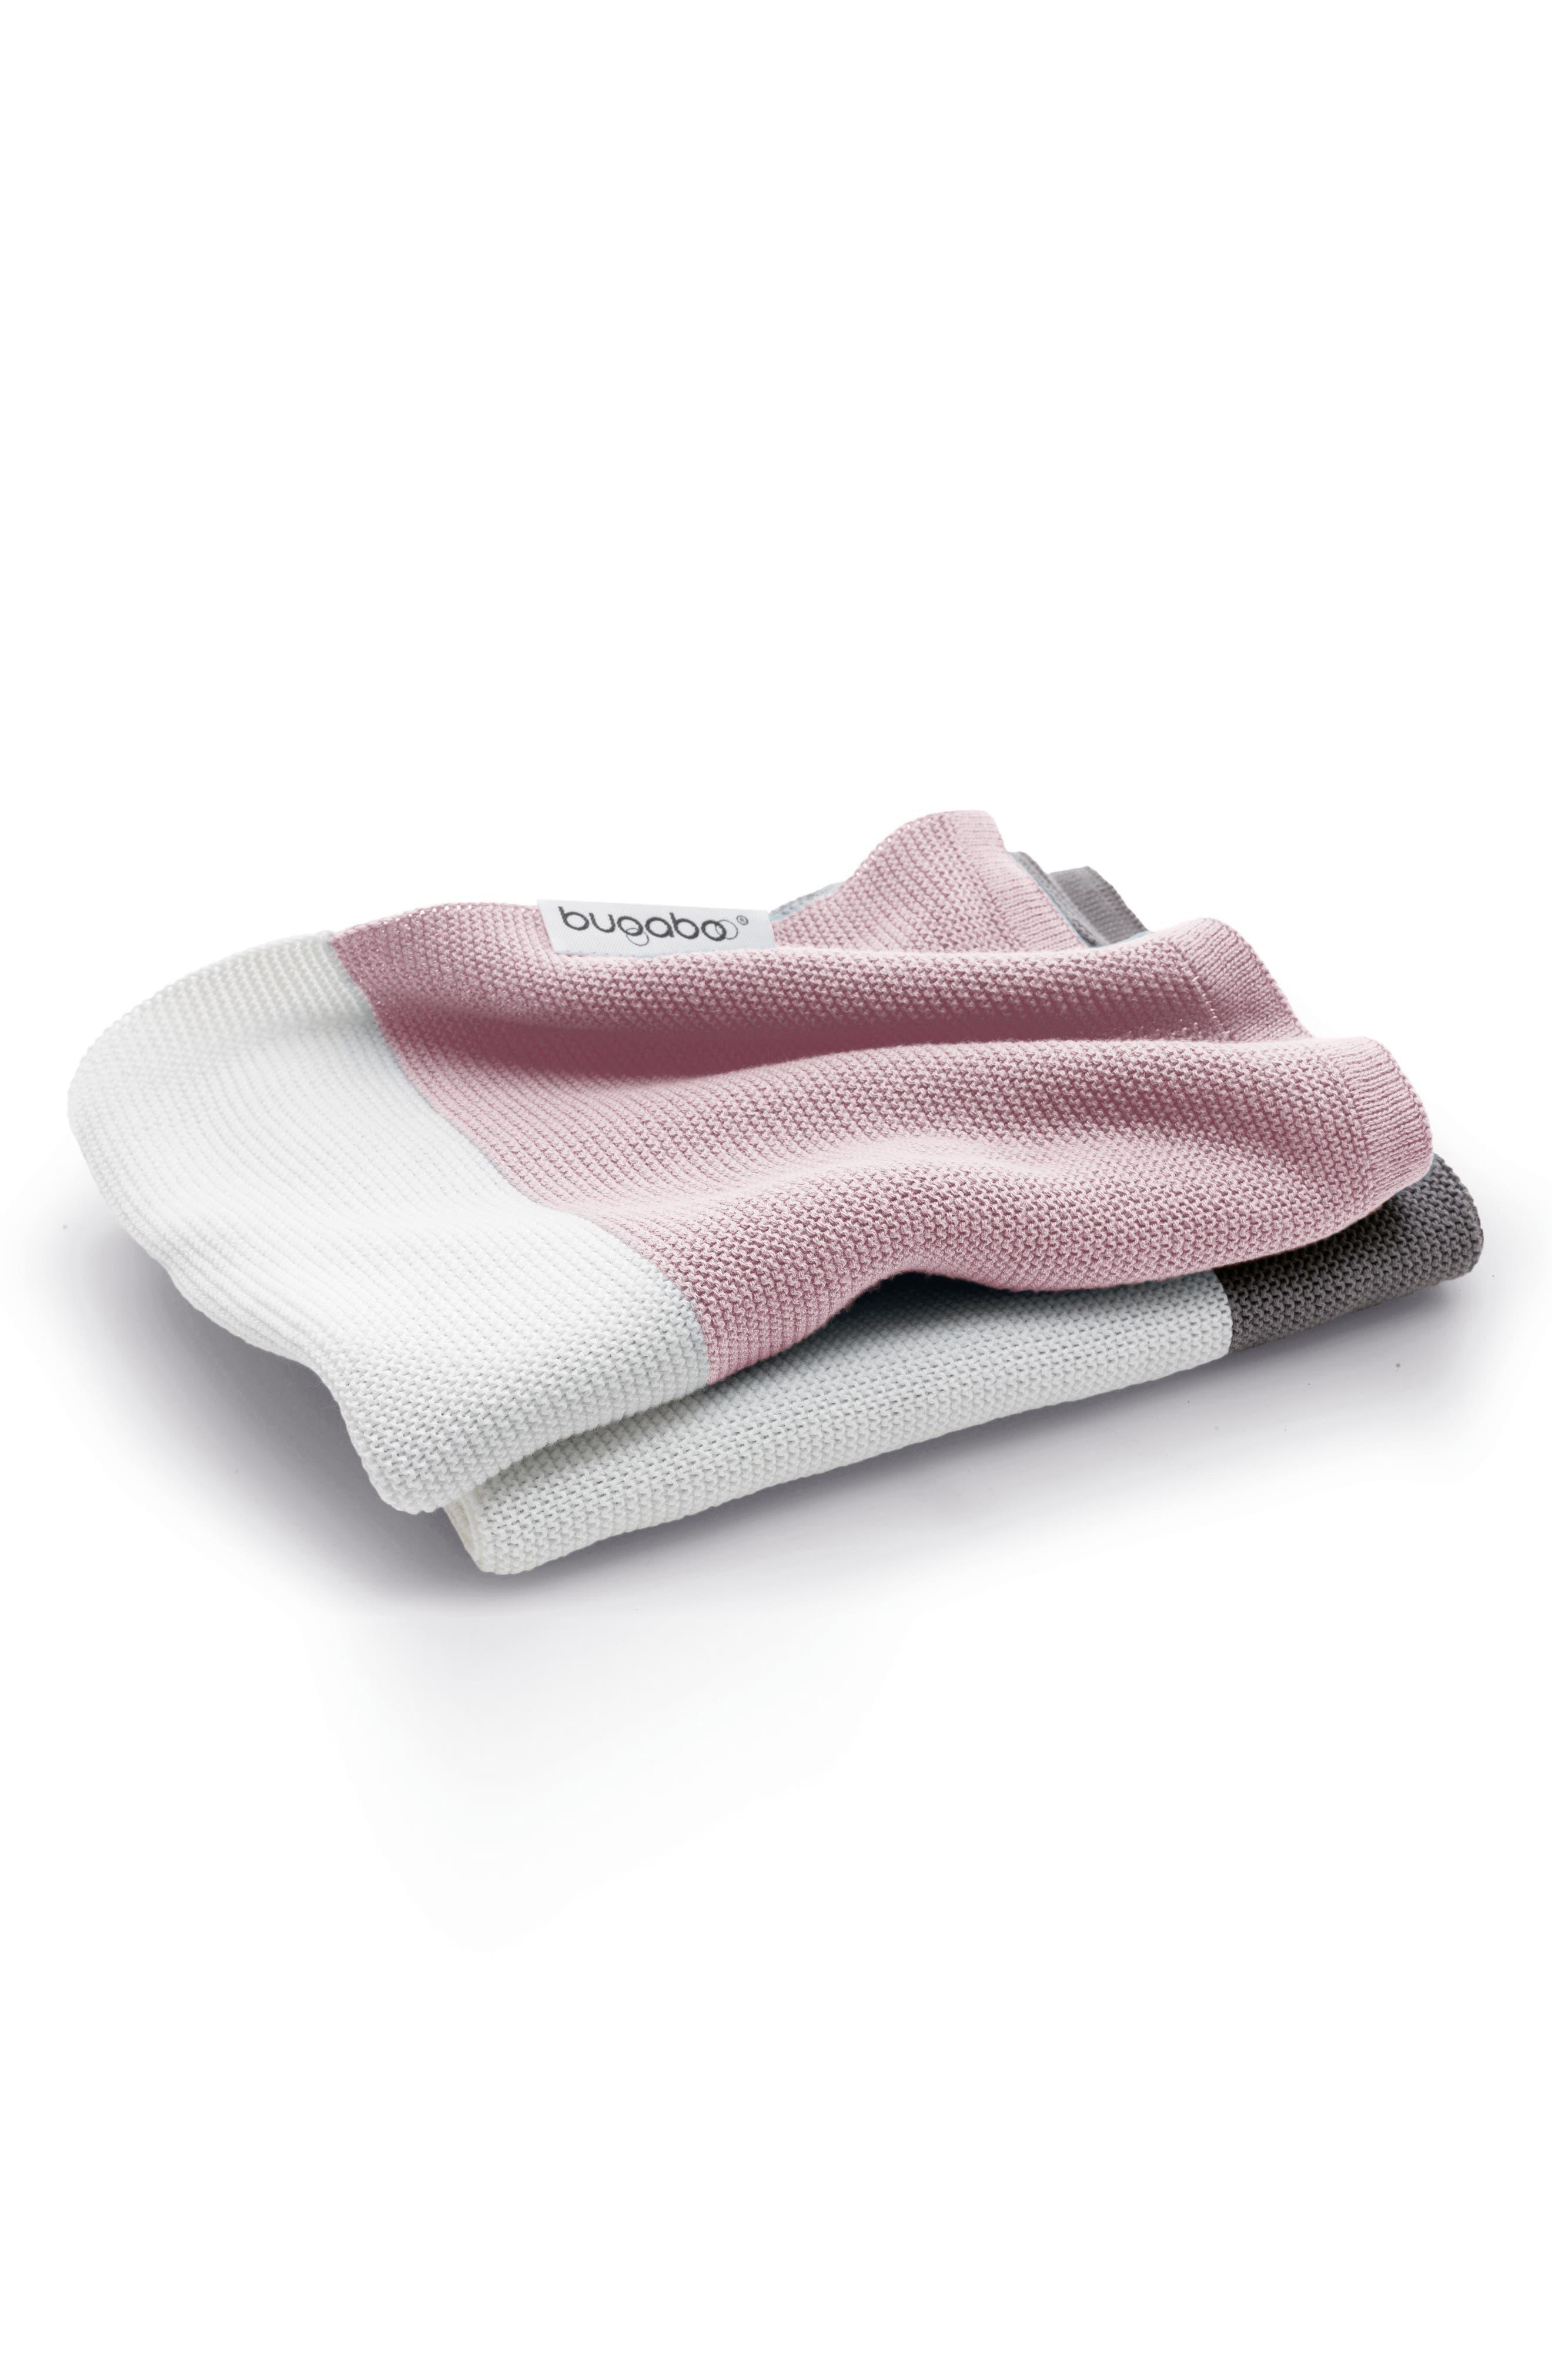 Light Cotton Blanket,                         Main,                         color, SOFT PINK